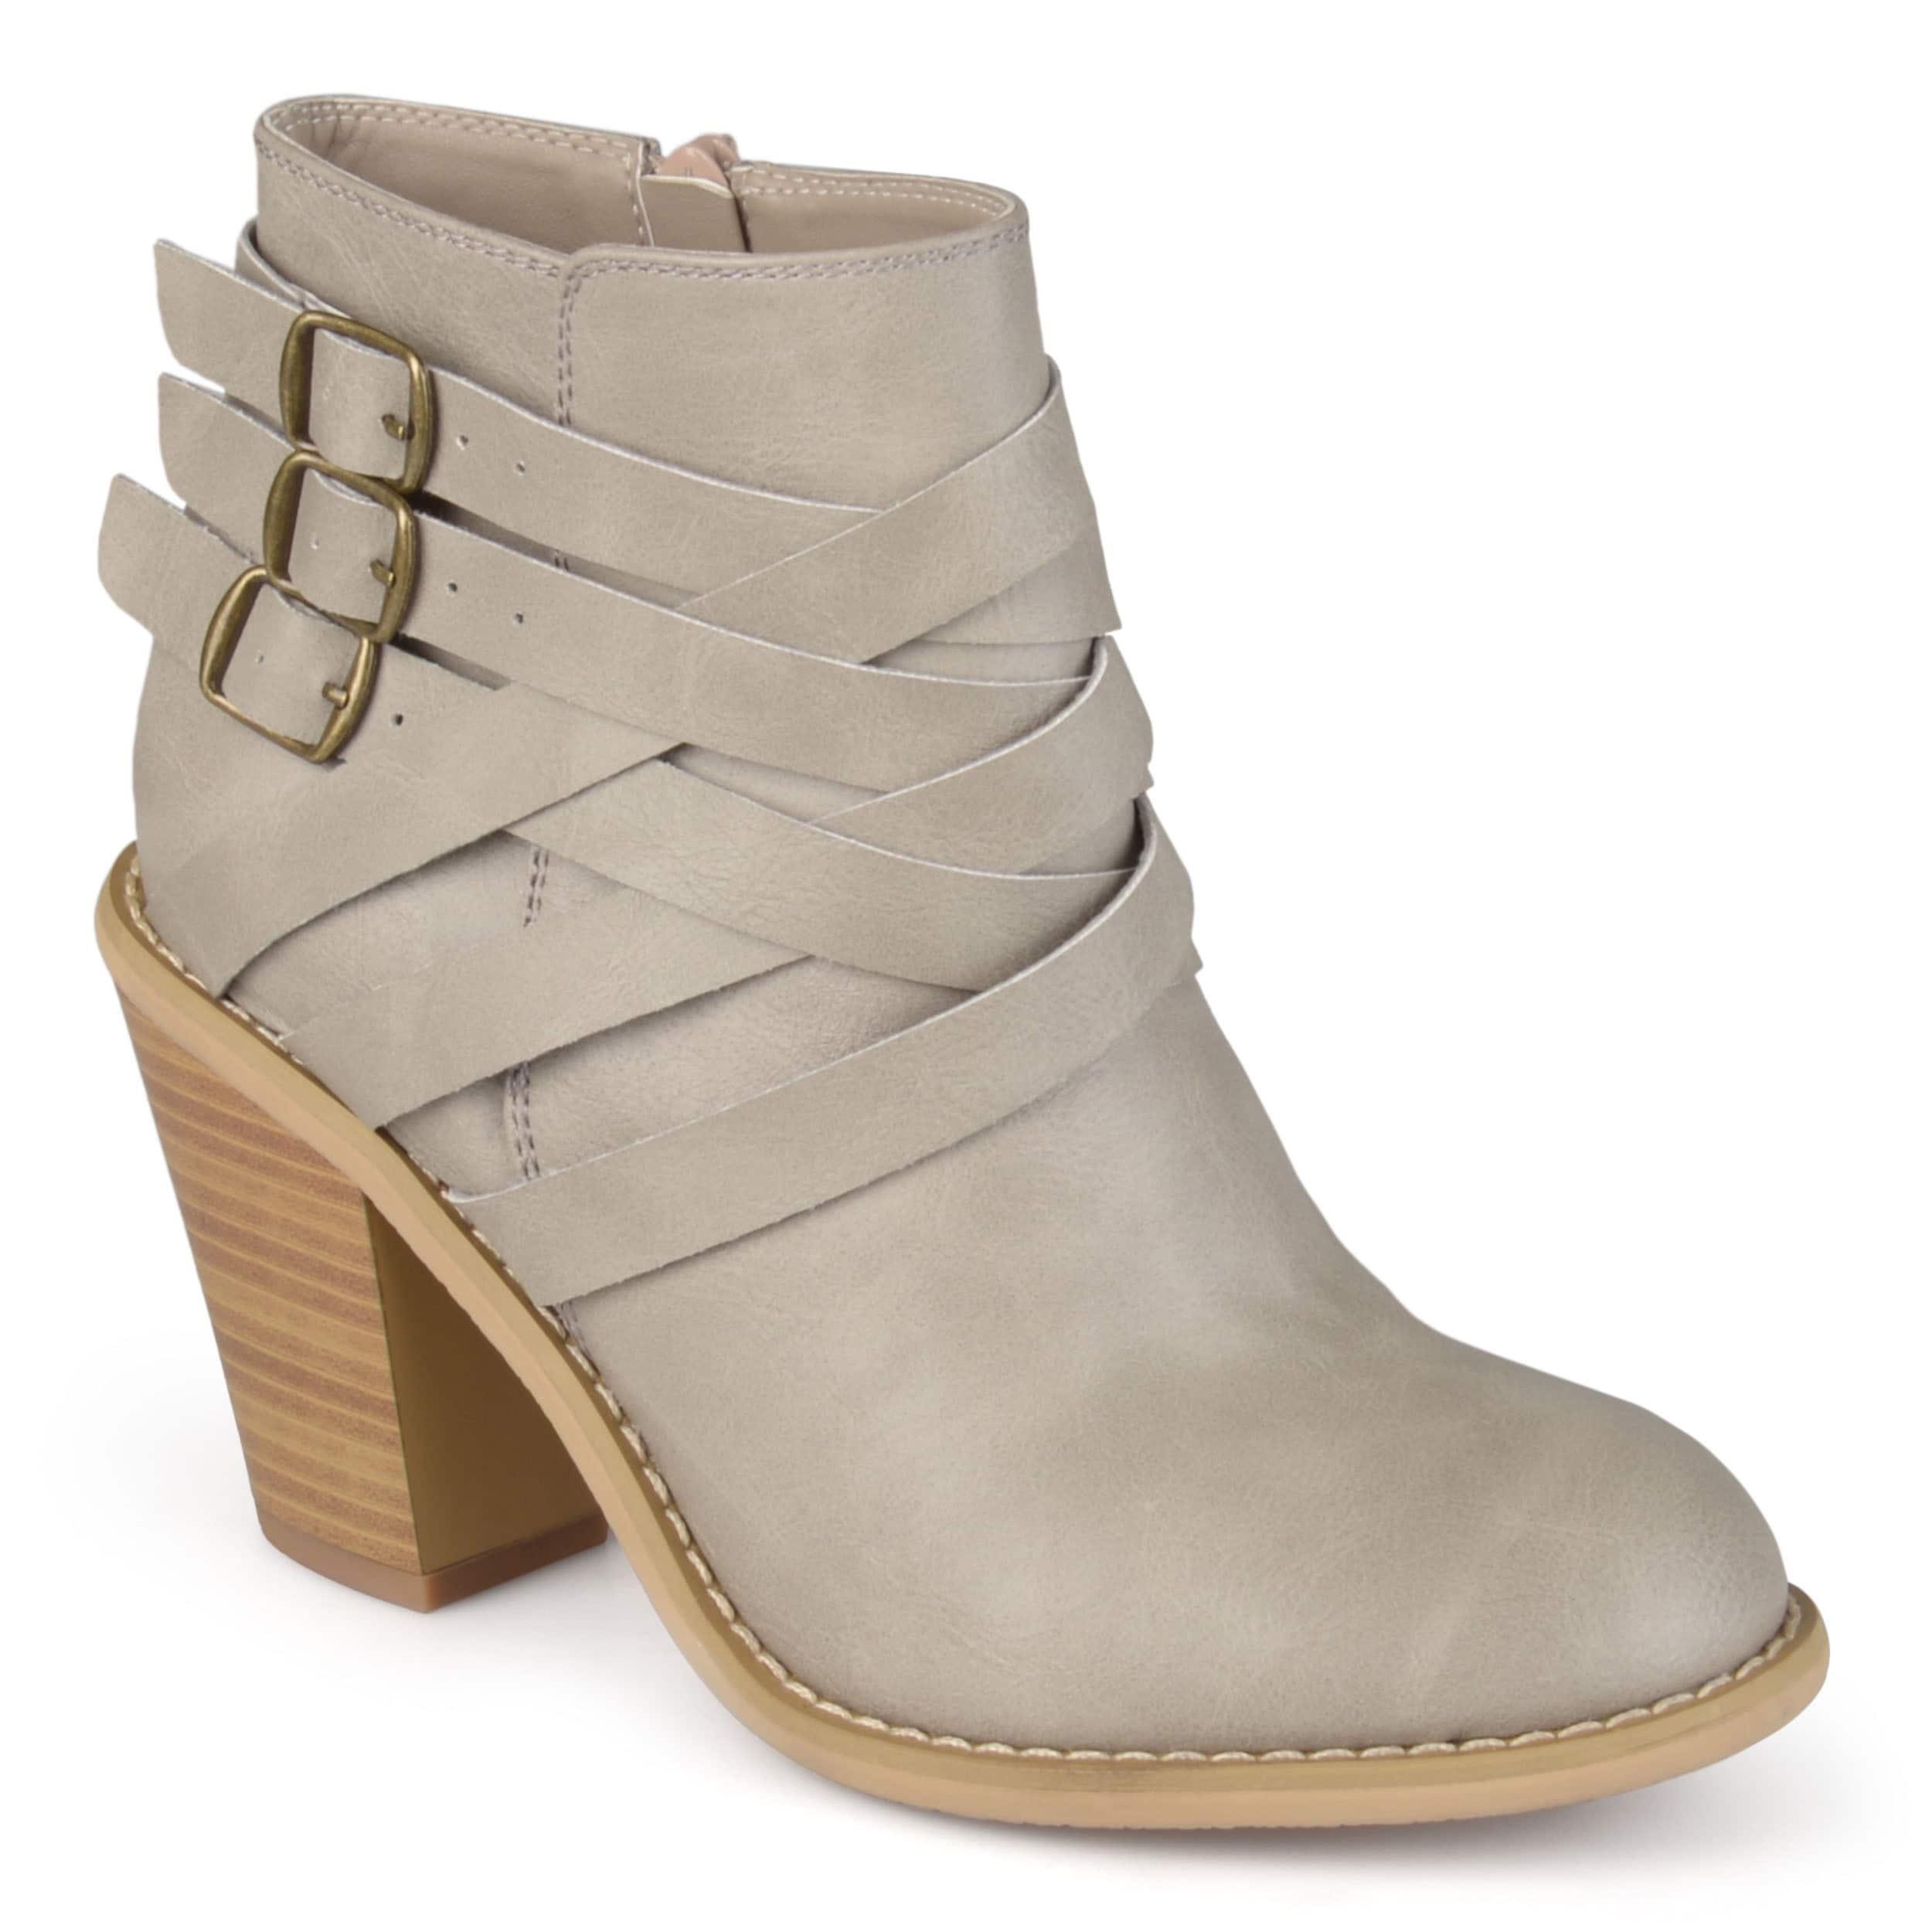 100c90e6d13b Buy Women s Boots Online at Overstock